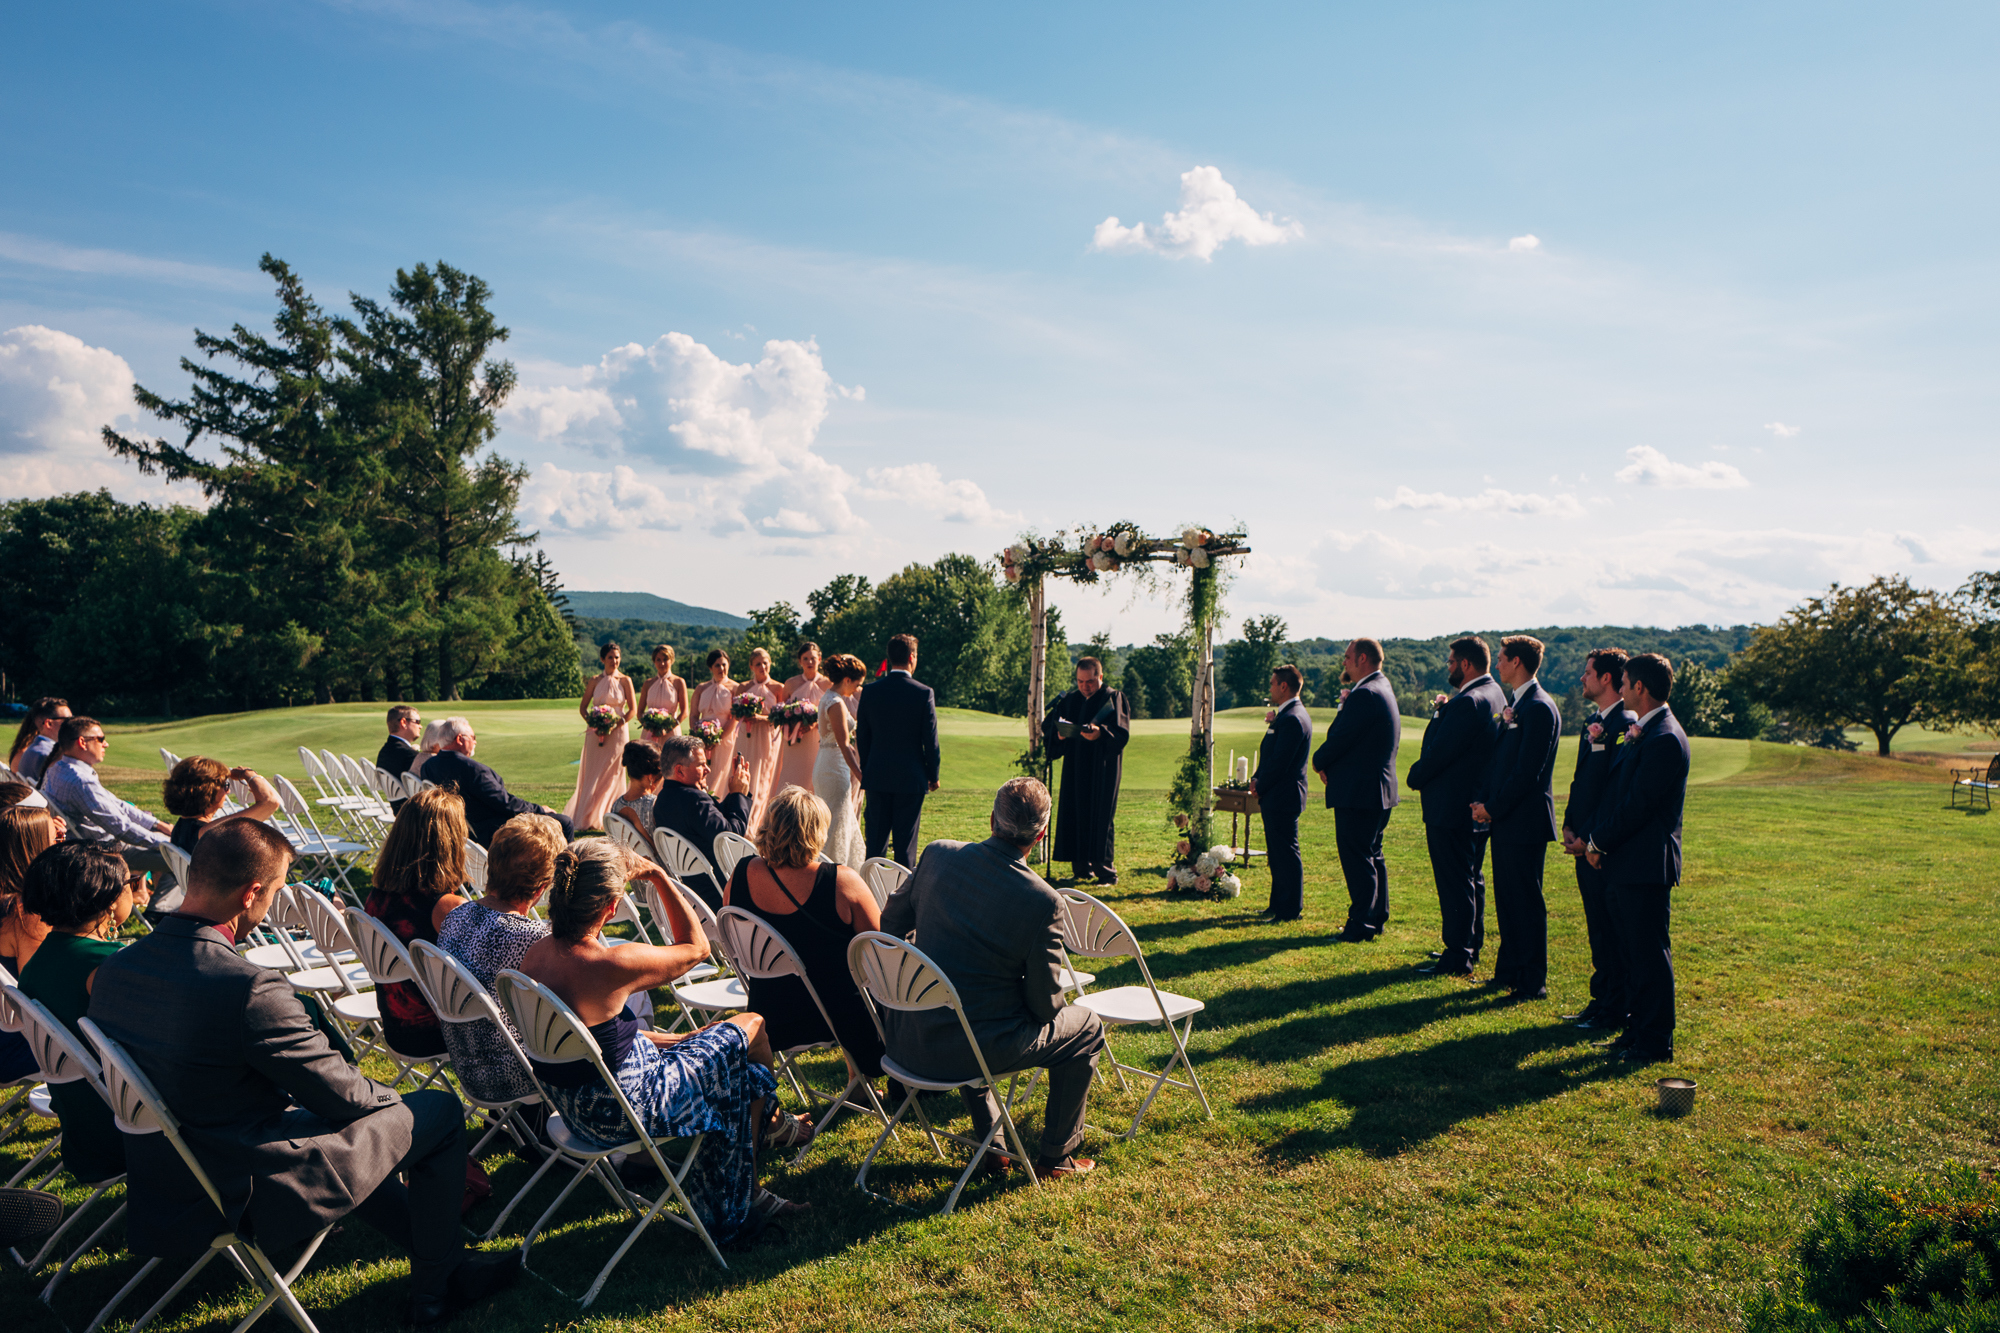 scranton-wedding-photography-zak-zavada-2016.06-rebeccaIan-0444.jpg